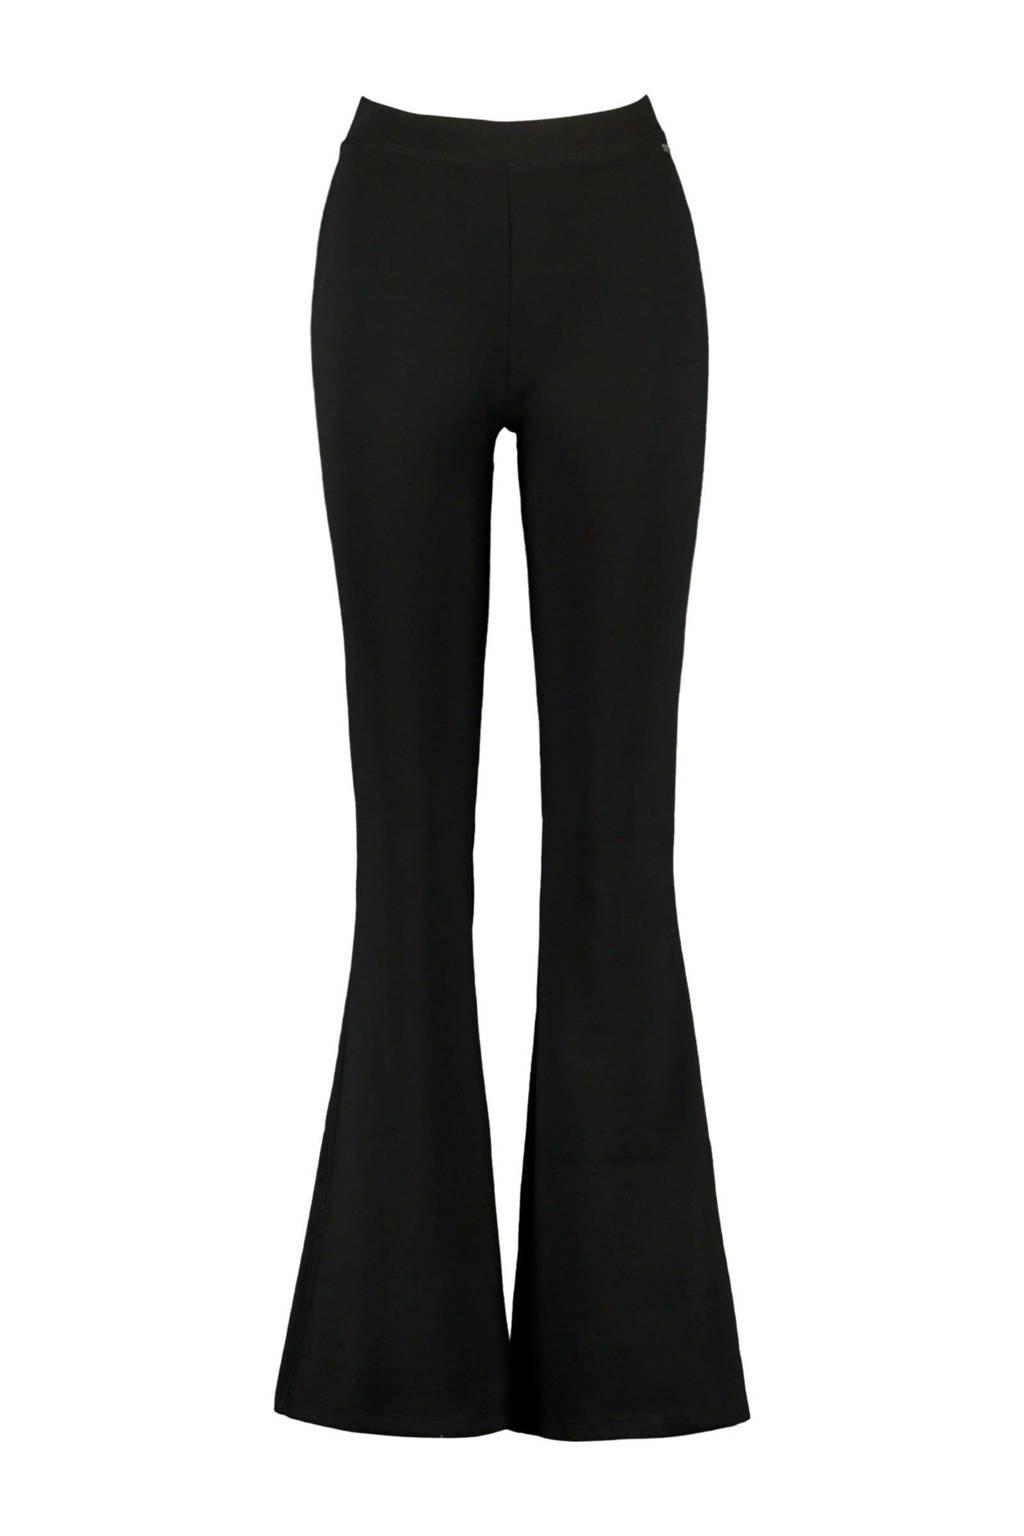 America Today high waist flared broek zwart, Zwart